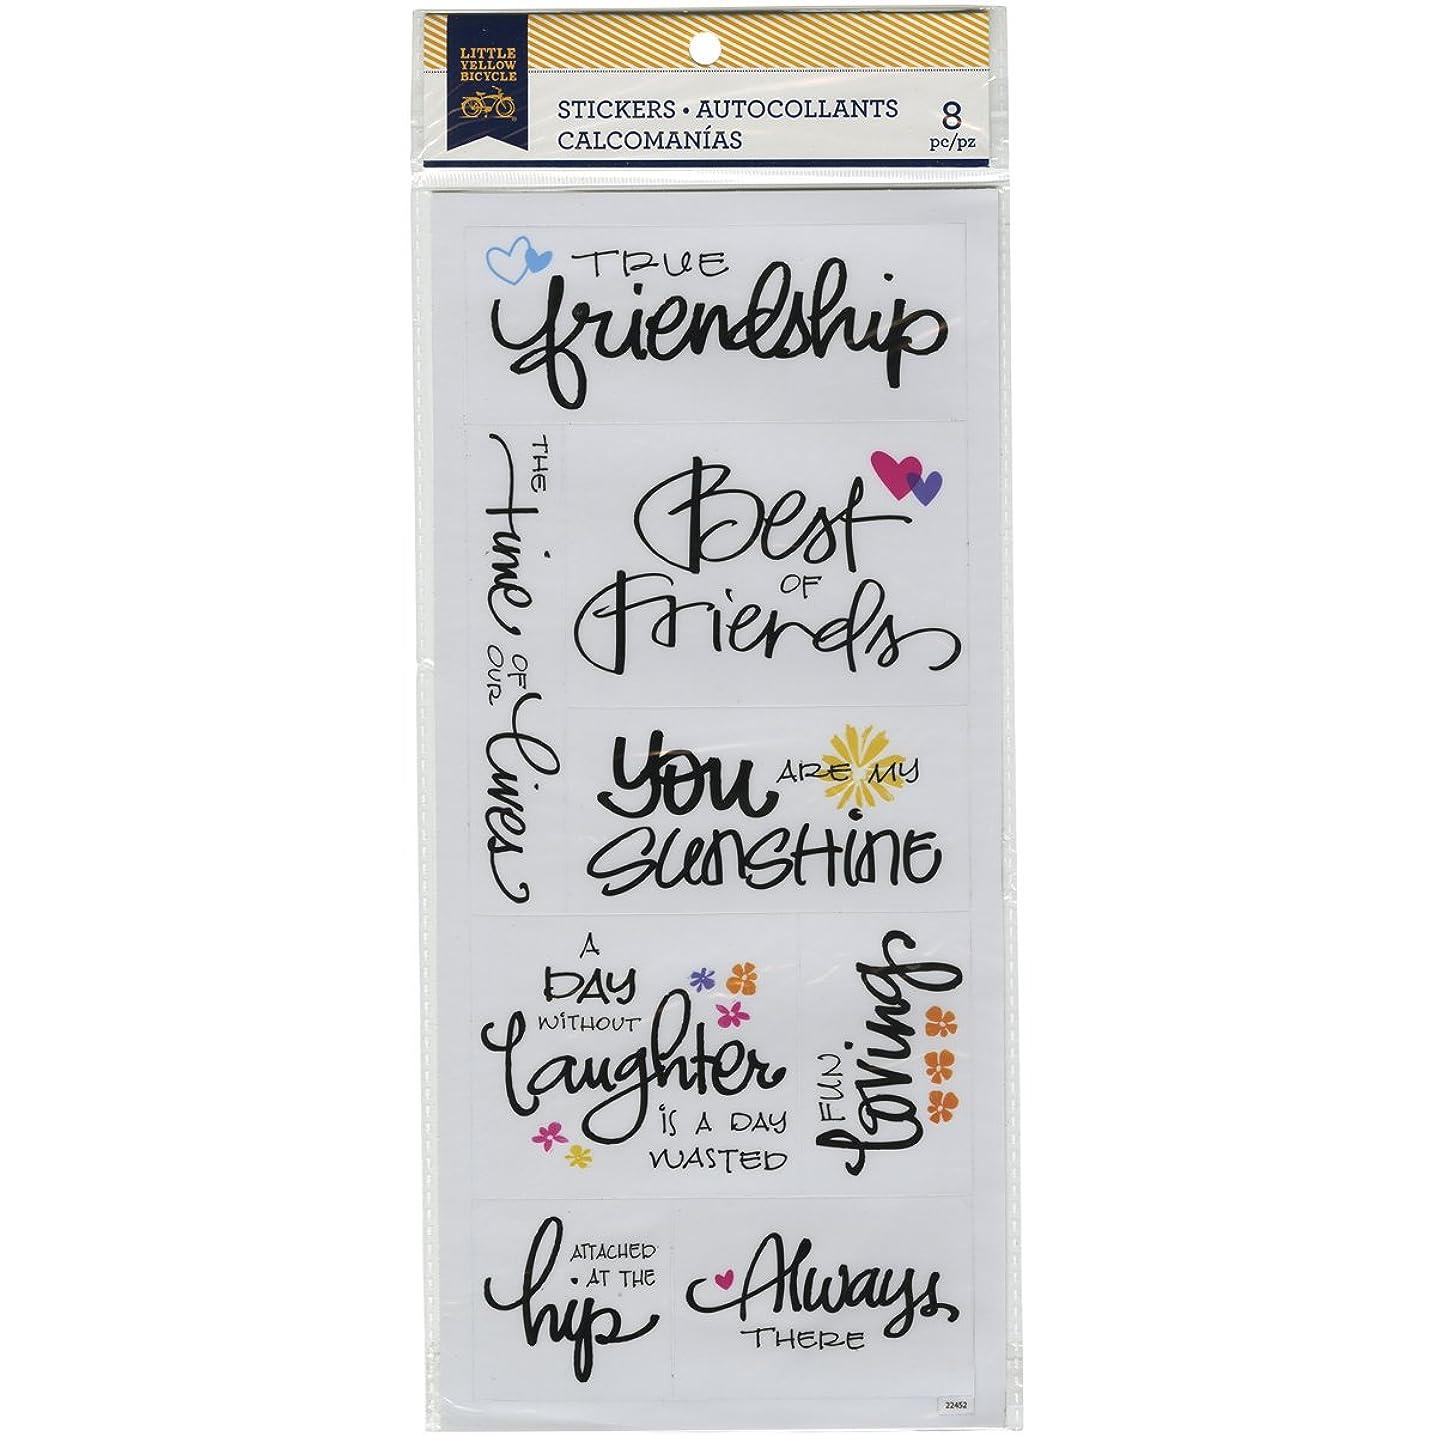 Momenta 22452 Little Yellow Bicycle Friendship Vellum Stickers